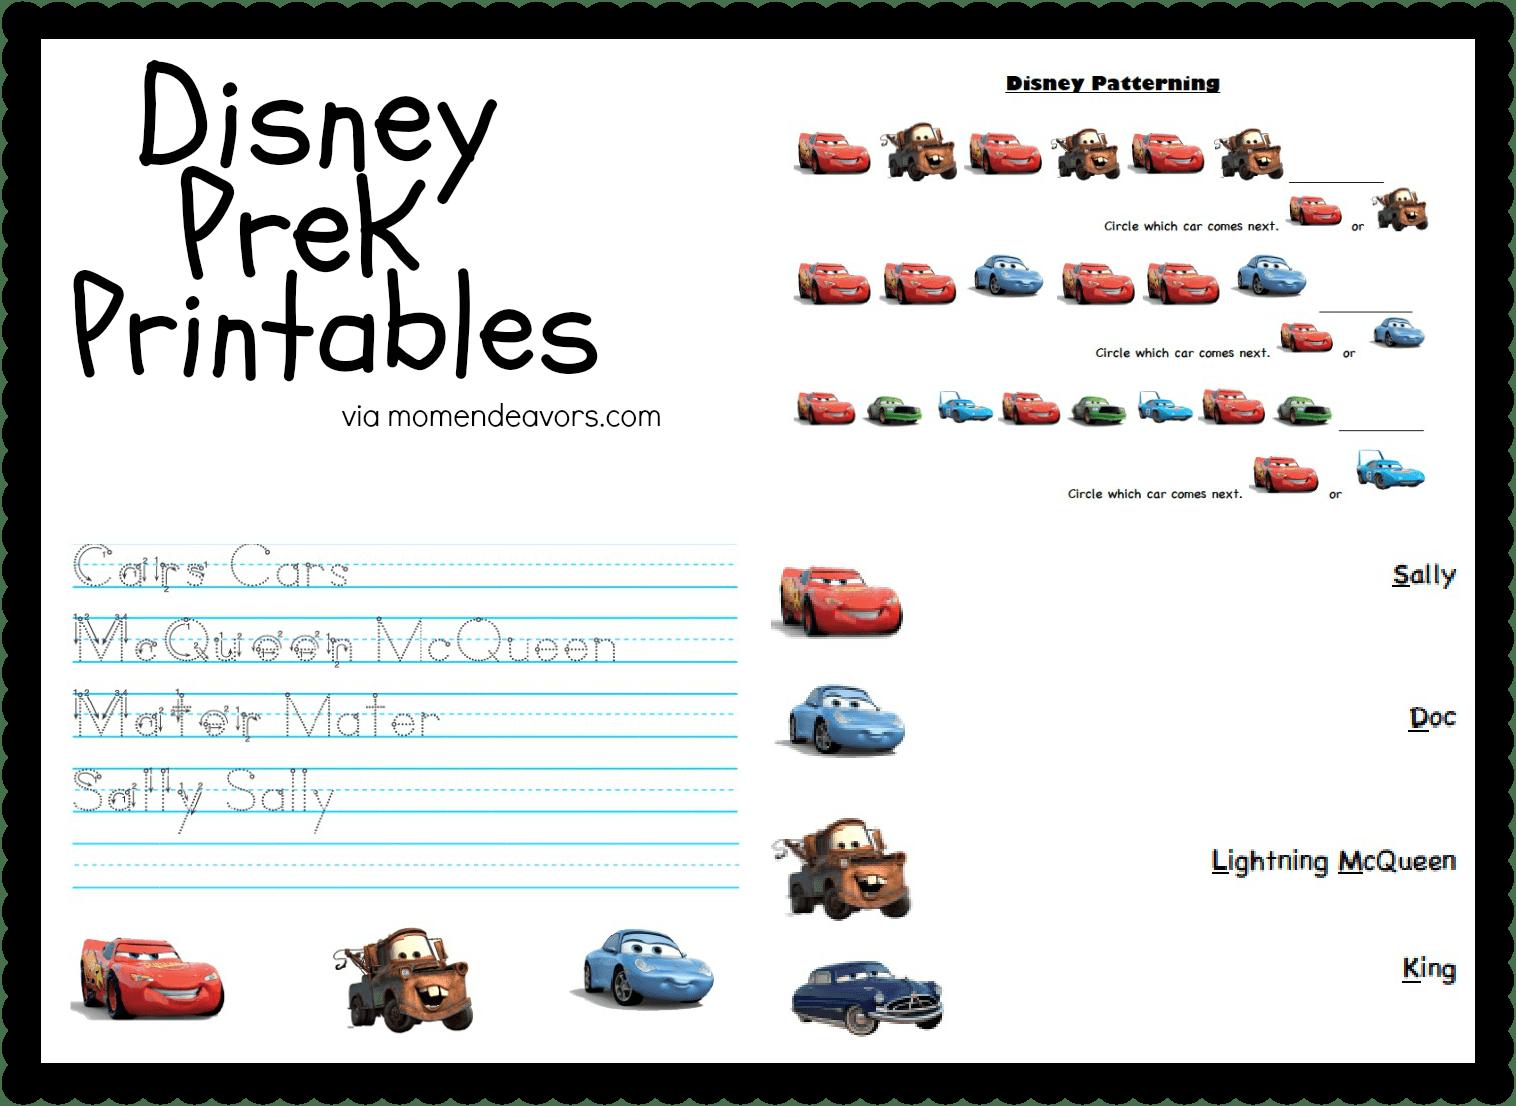 Disney Pixar Cars Prek Printable Activity Sheets Disney